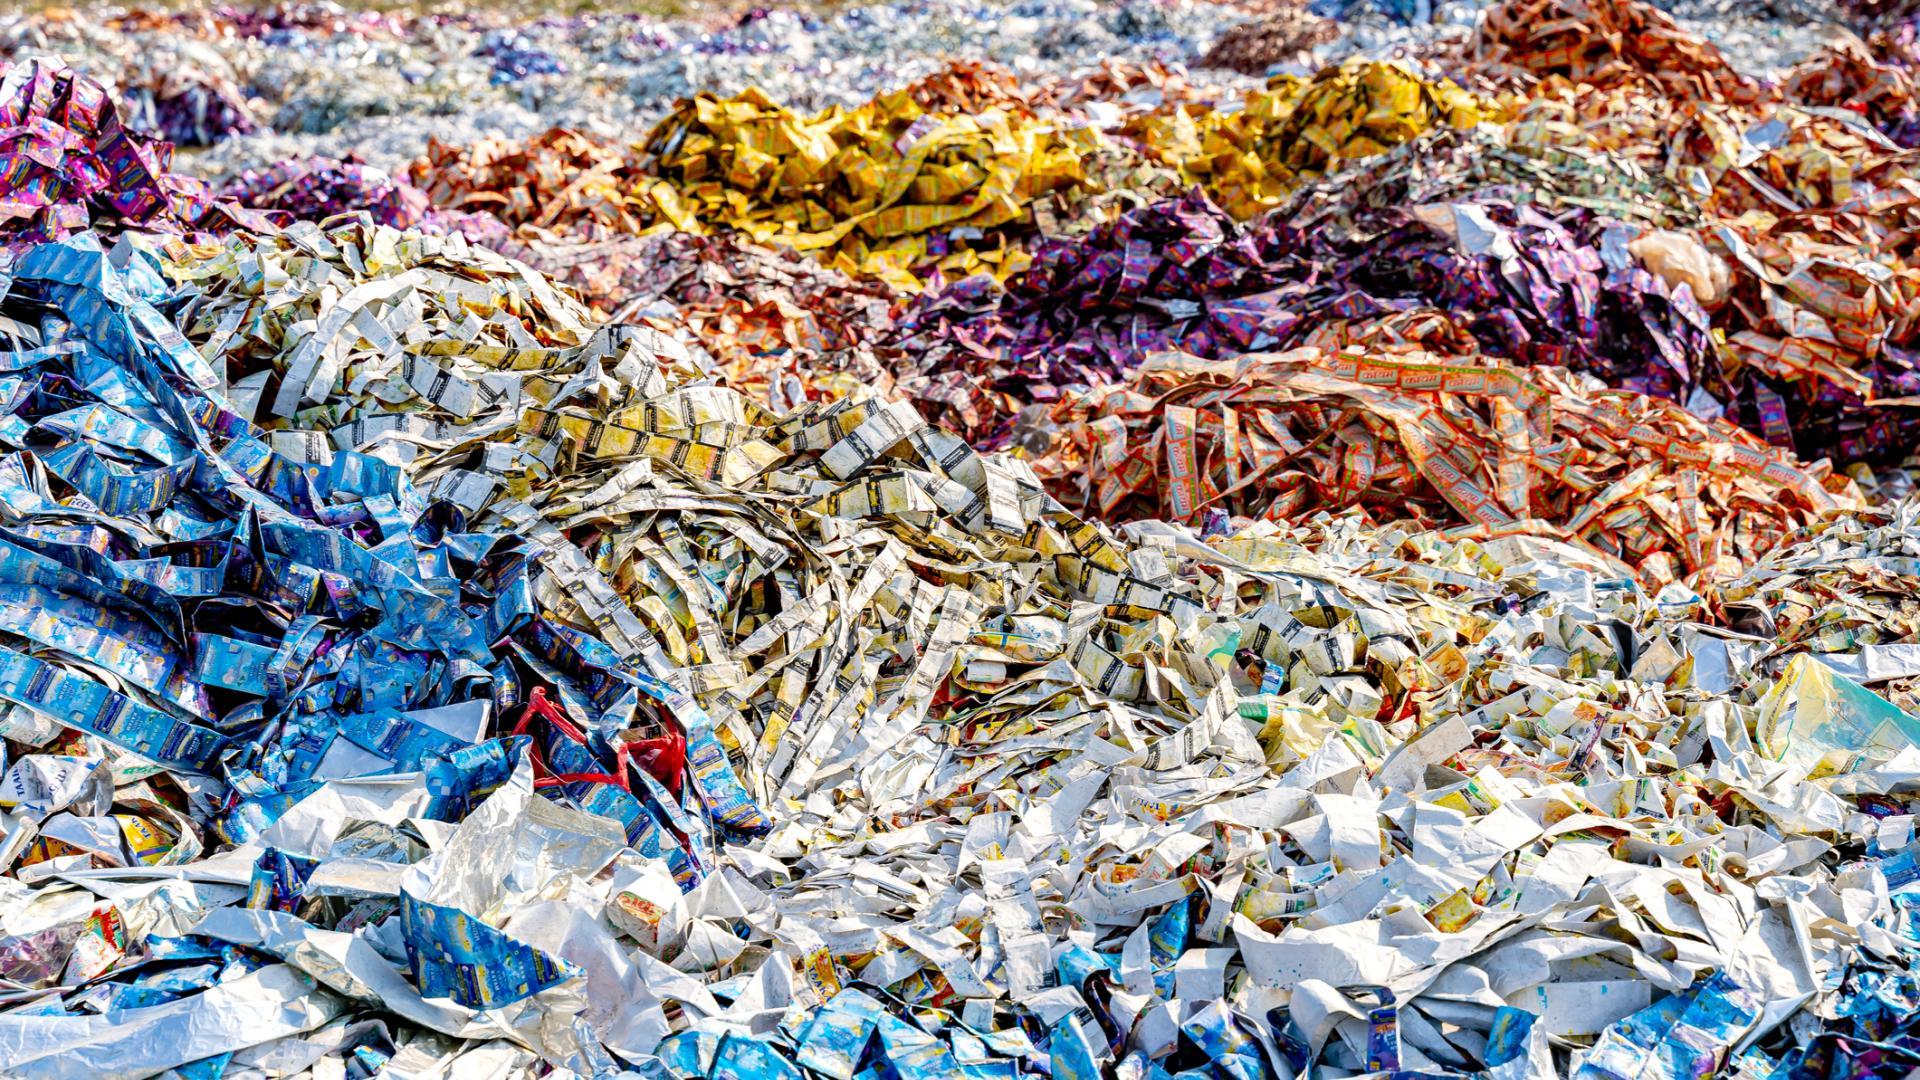 Plastikberge Februar 2020 in Indien Mikroplastik